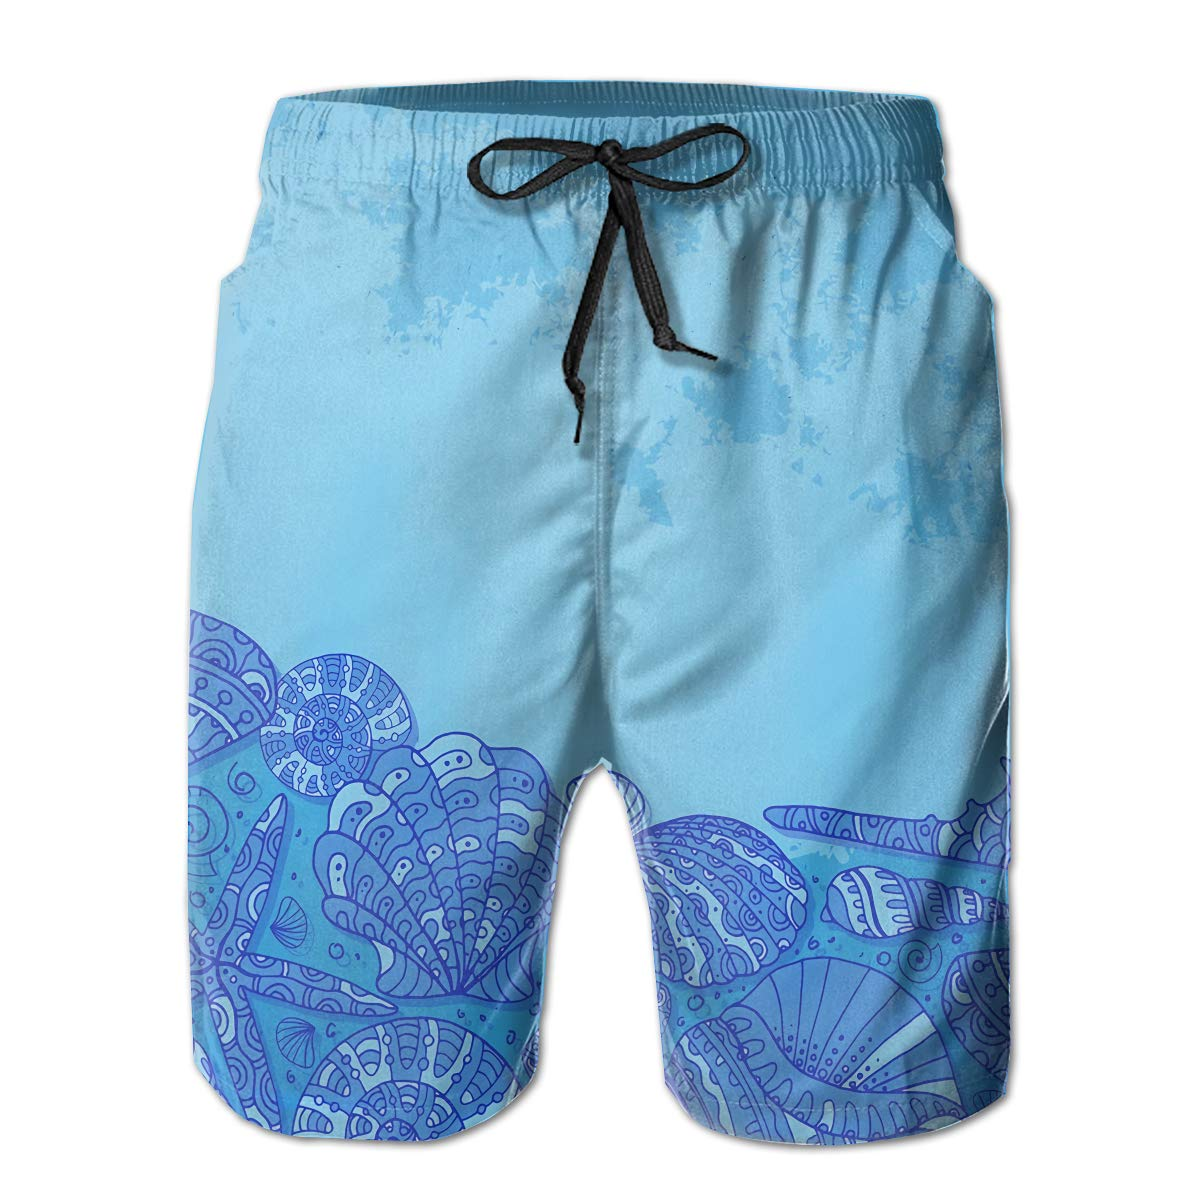 Rigg-pants Mens Comfortable Hawaii Beach Hiphop Cool Beach Shorts Swim Trunks Board Shorts